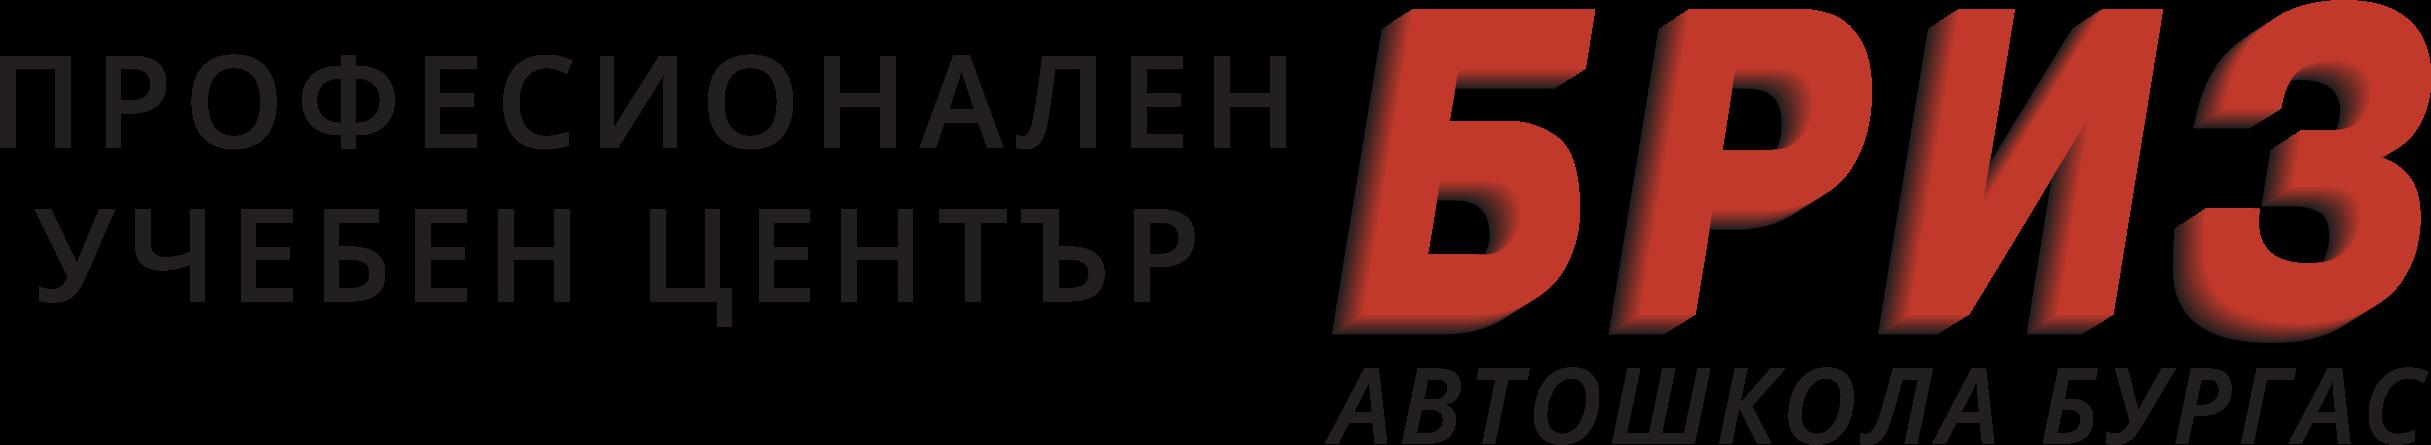 Автошкола Бриз